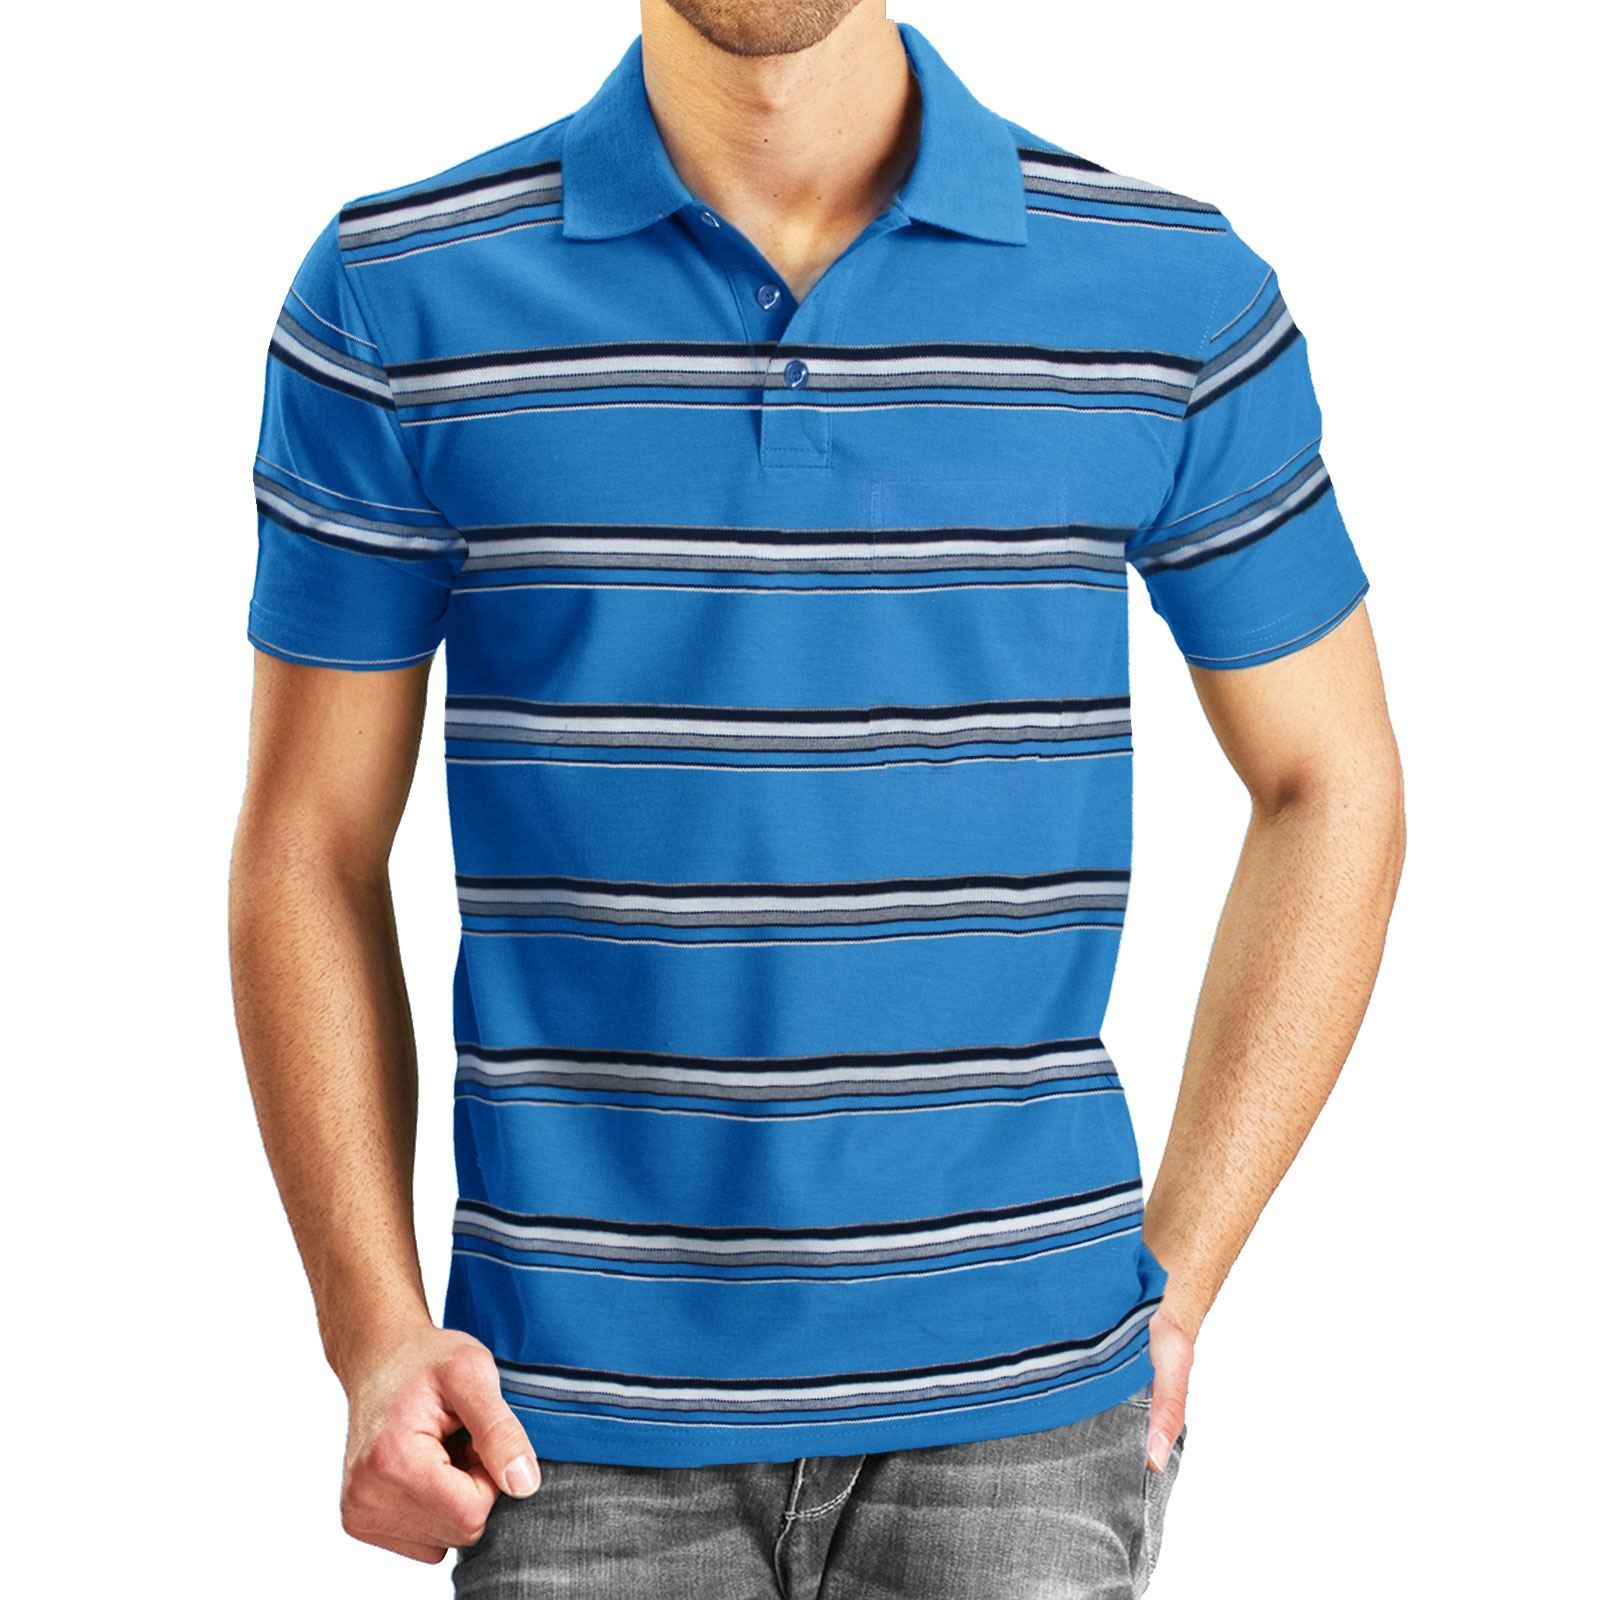 s xxl mens polo tops t shirts short sleeves tees pique collar sports golf tennis. Black Bedroom Furniture Sets. Home Design Ideas